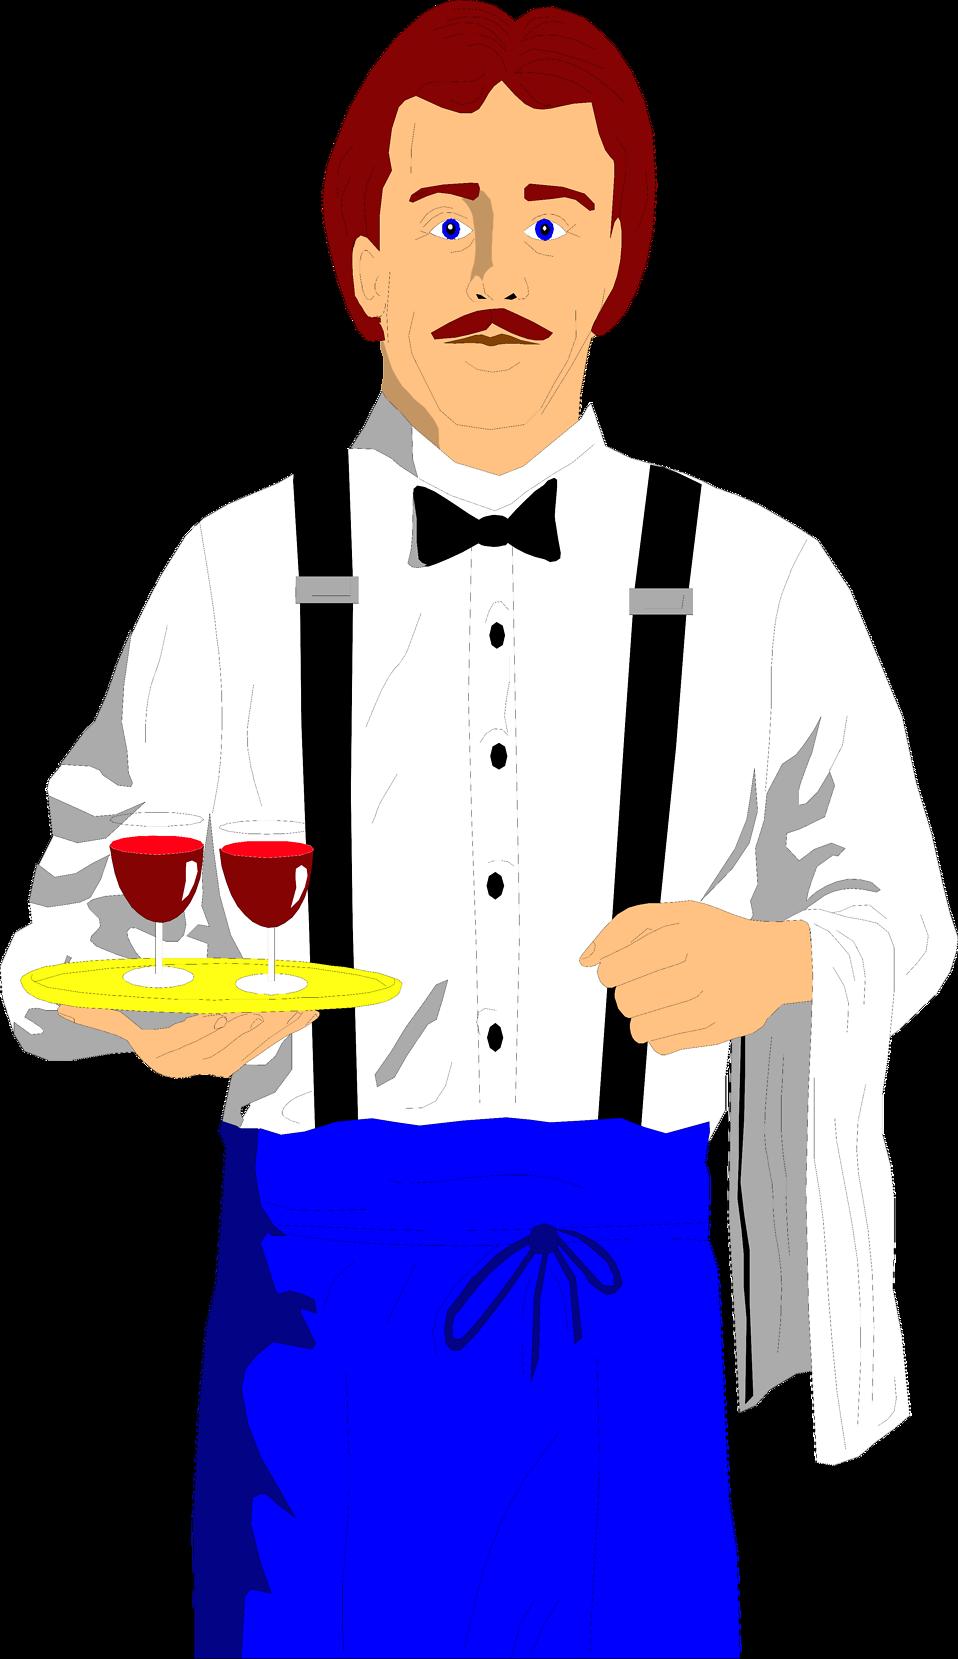 958x1659 Waiter Free Stock Photo Illustration Of A Waiter With Wine